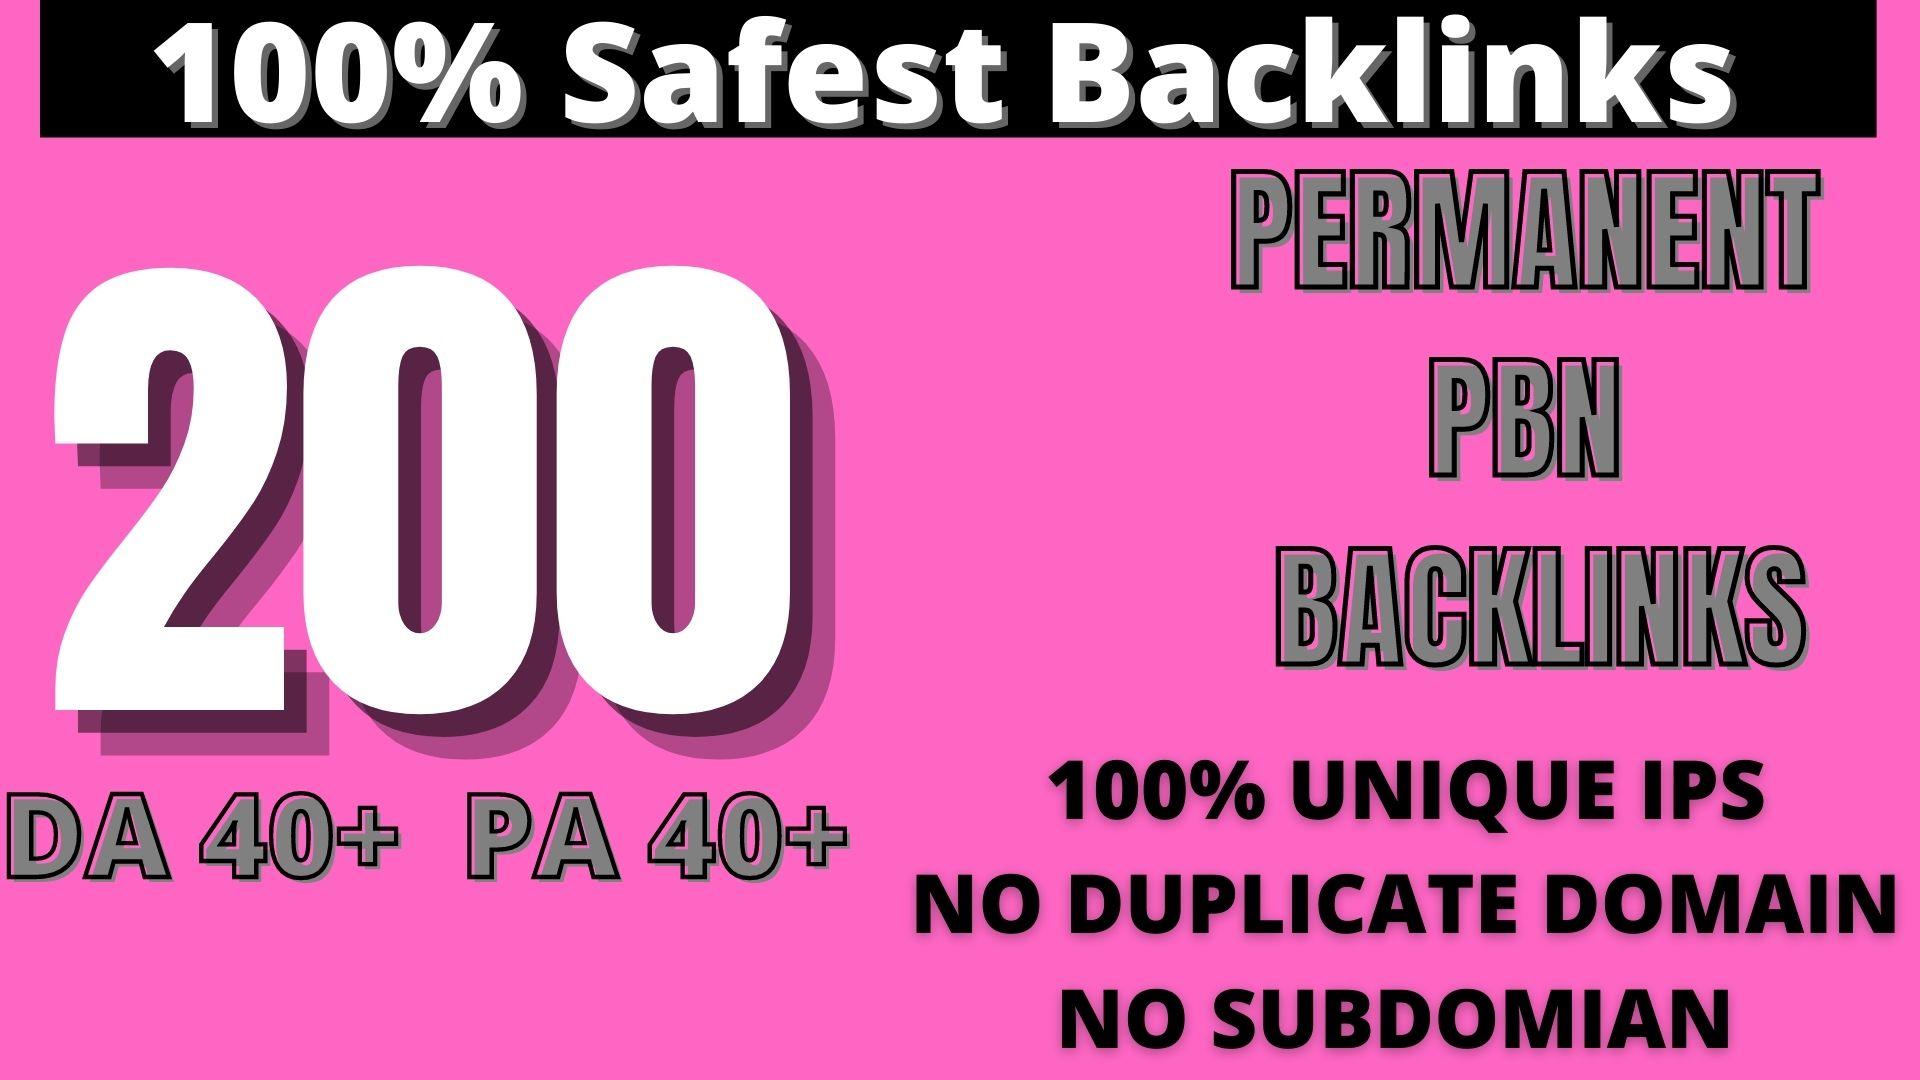 Create 200 HOMEPAGE PBN Backlinks 200 Dofollow & Permanent Links With High DA/PA/CF/TF web2.0